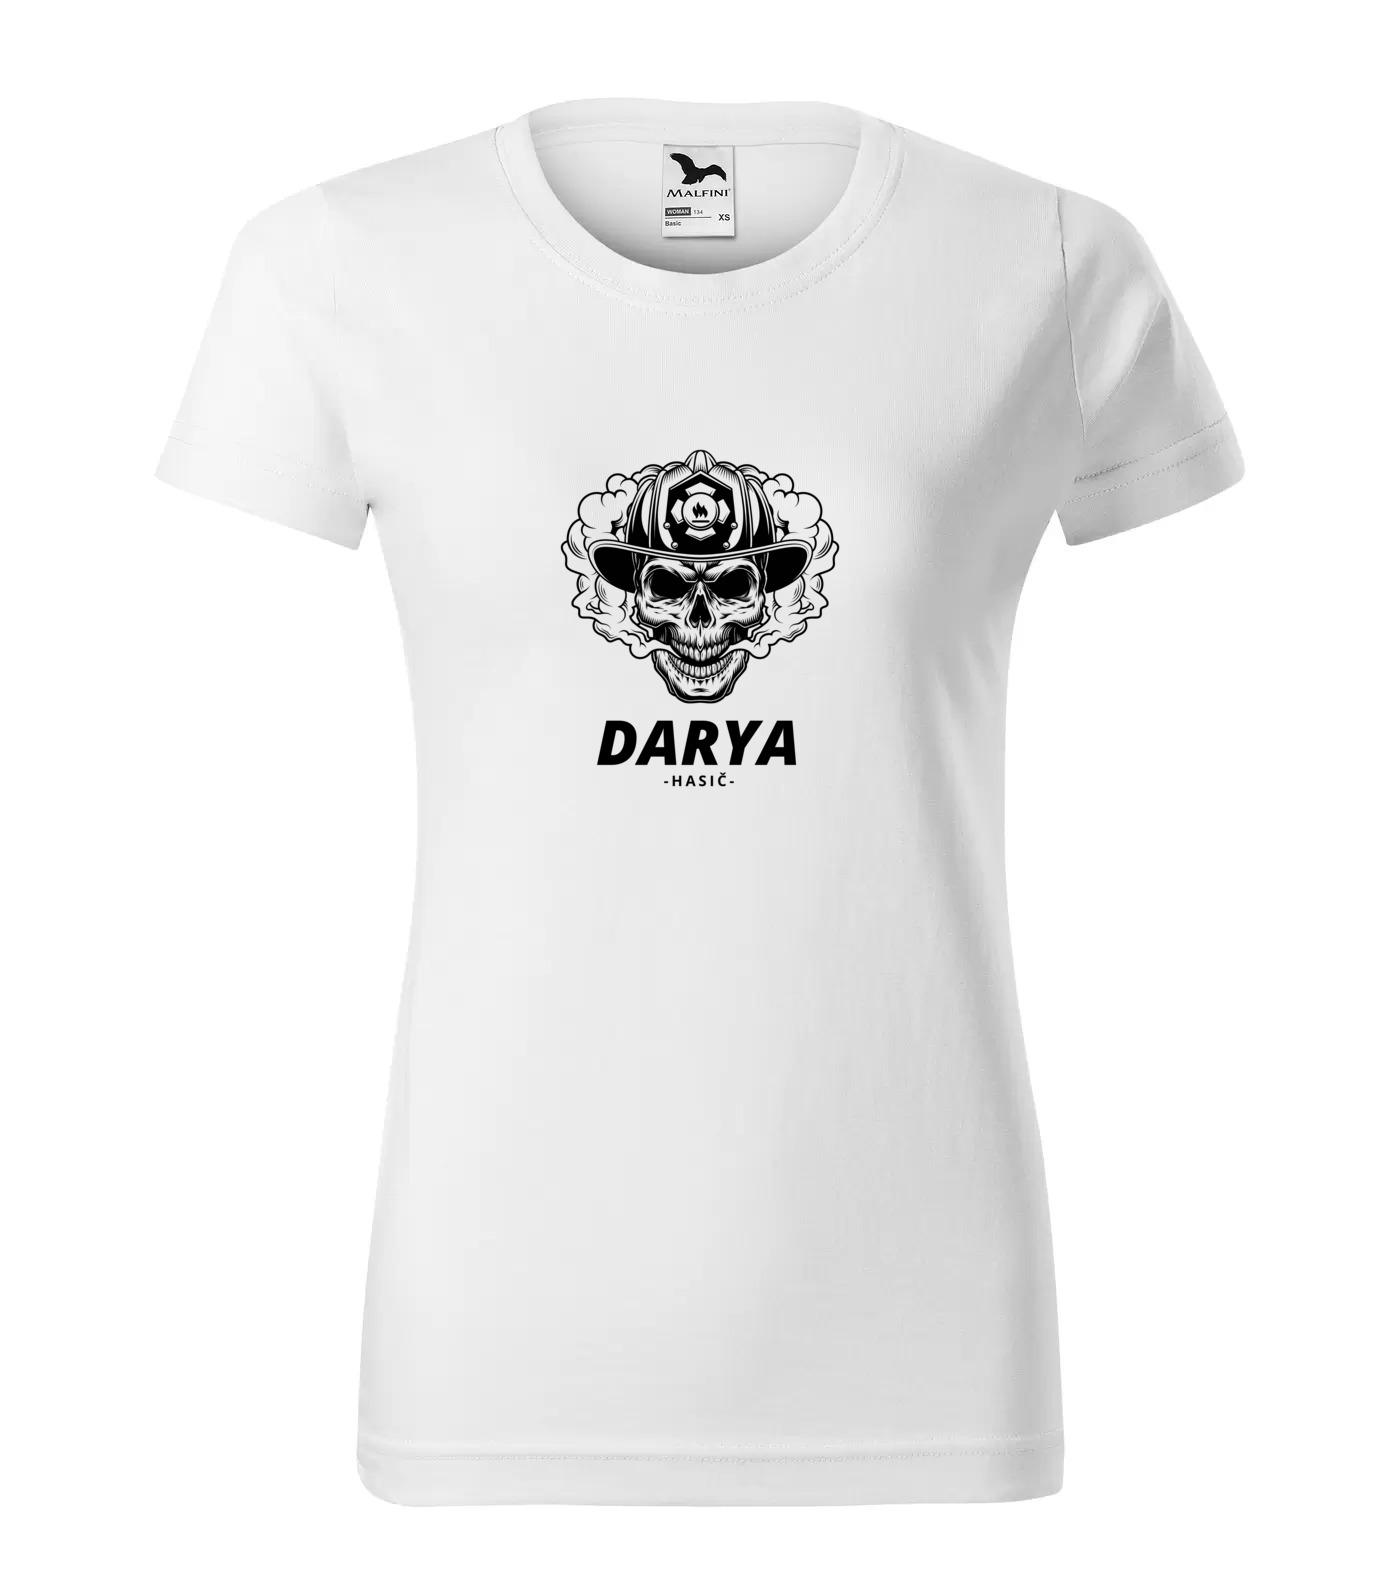 Tričko Hasič Darya